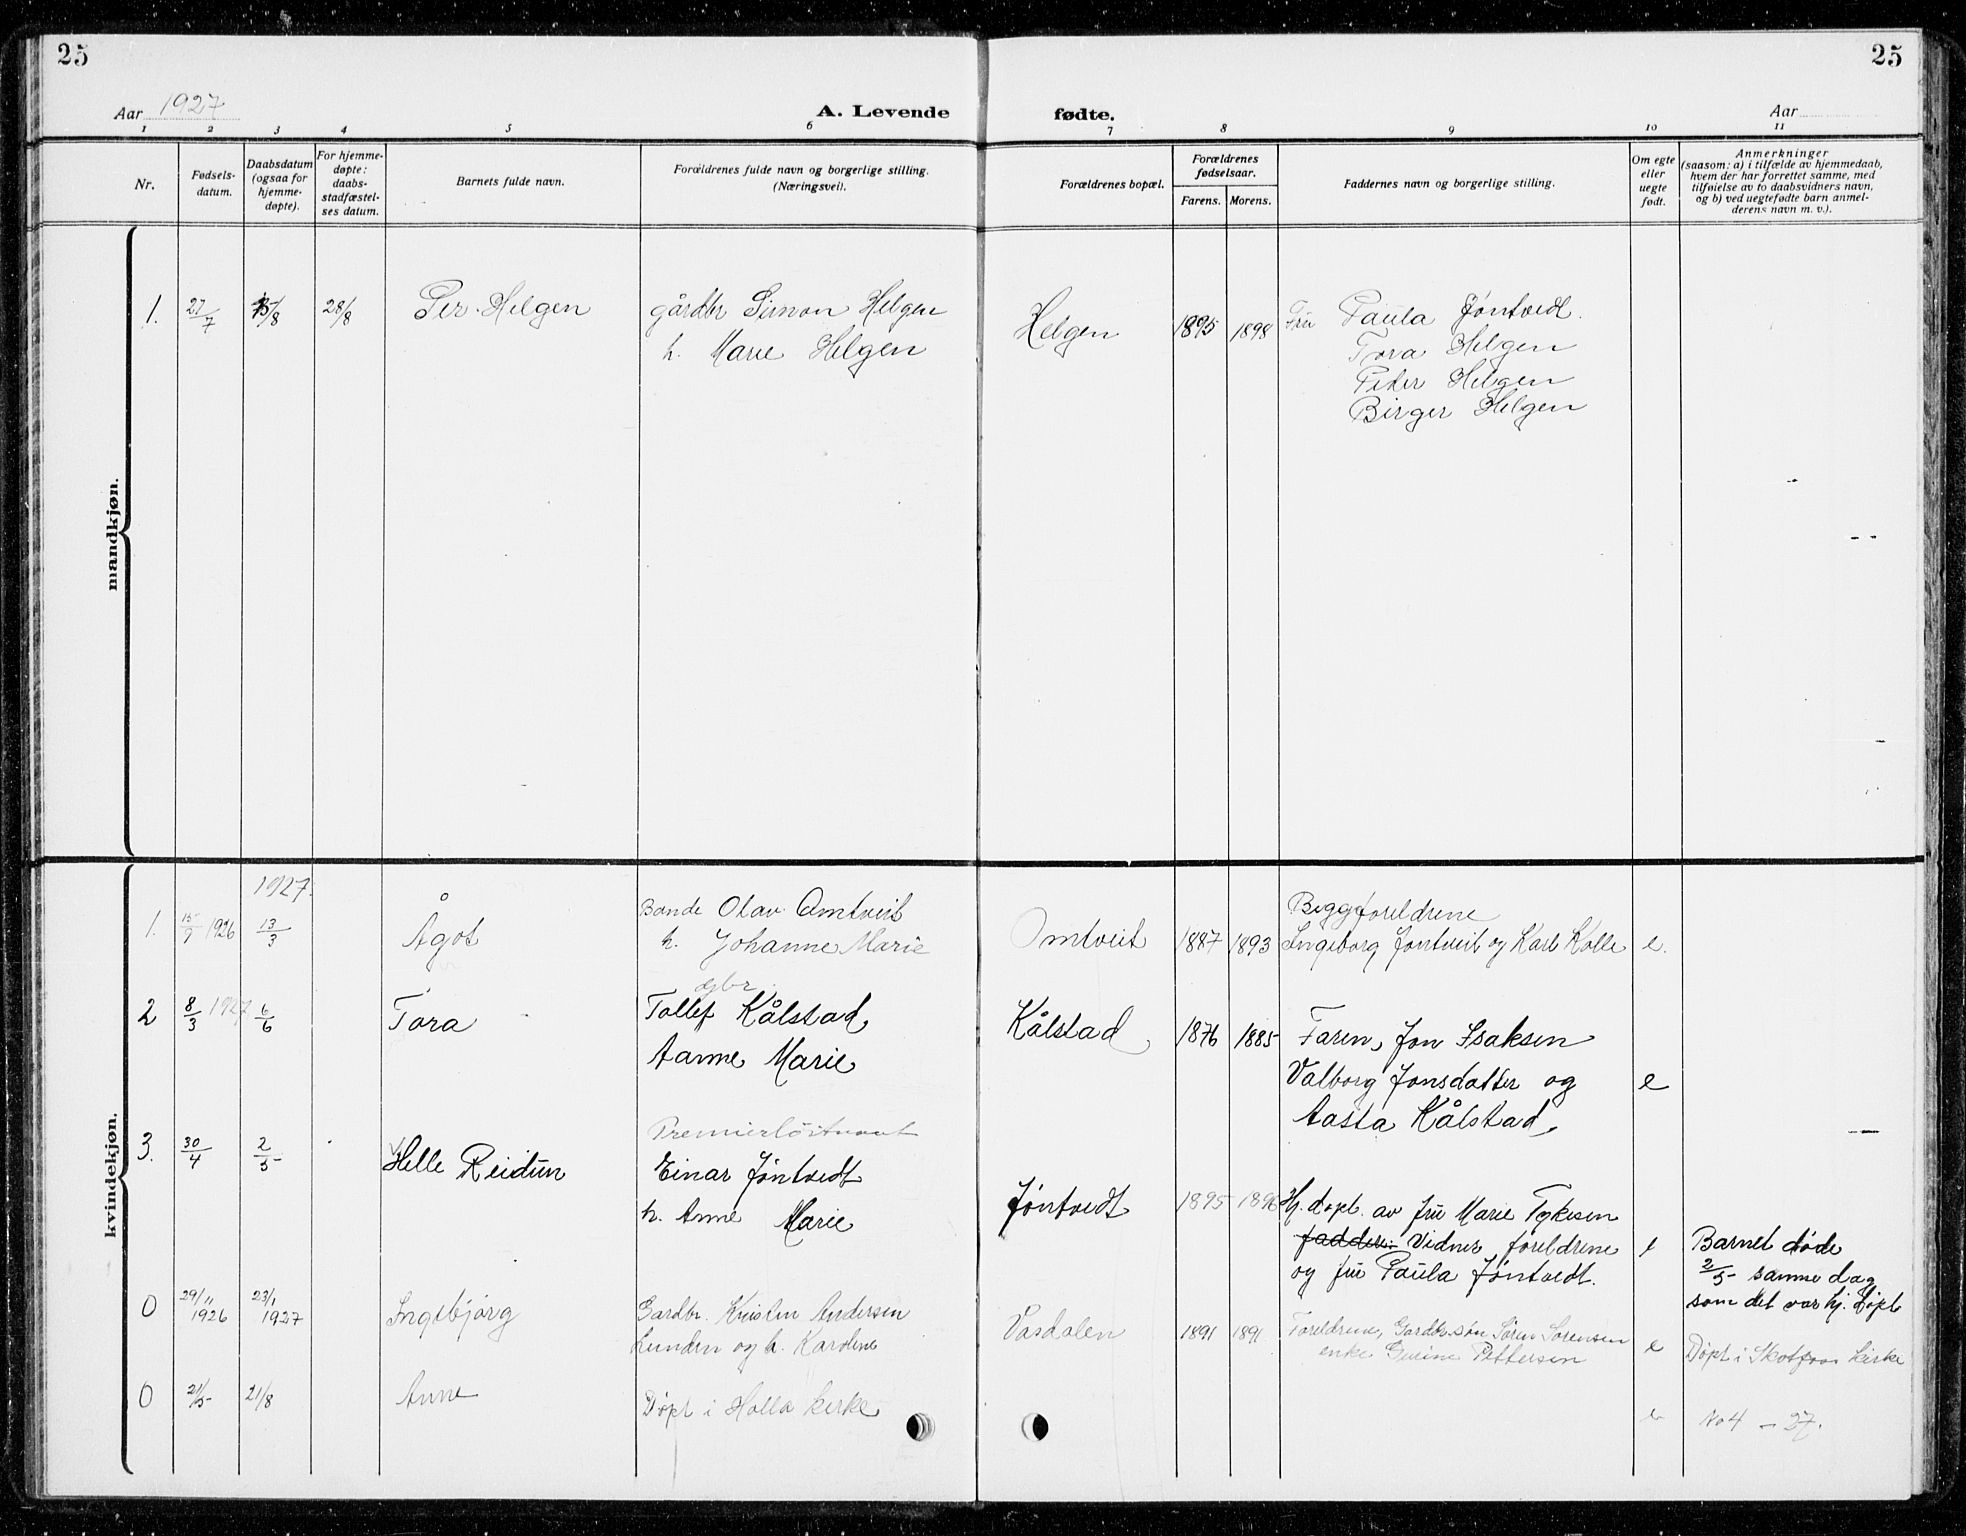 SAKO, Holla kirkebøker, G/Gb/L0003: Klokkerbok nr. II 3, 1914-1941, s. 25